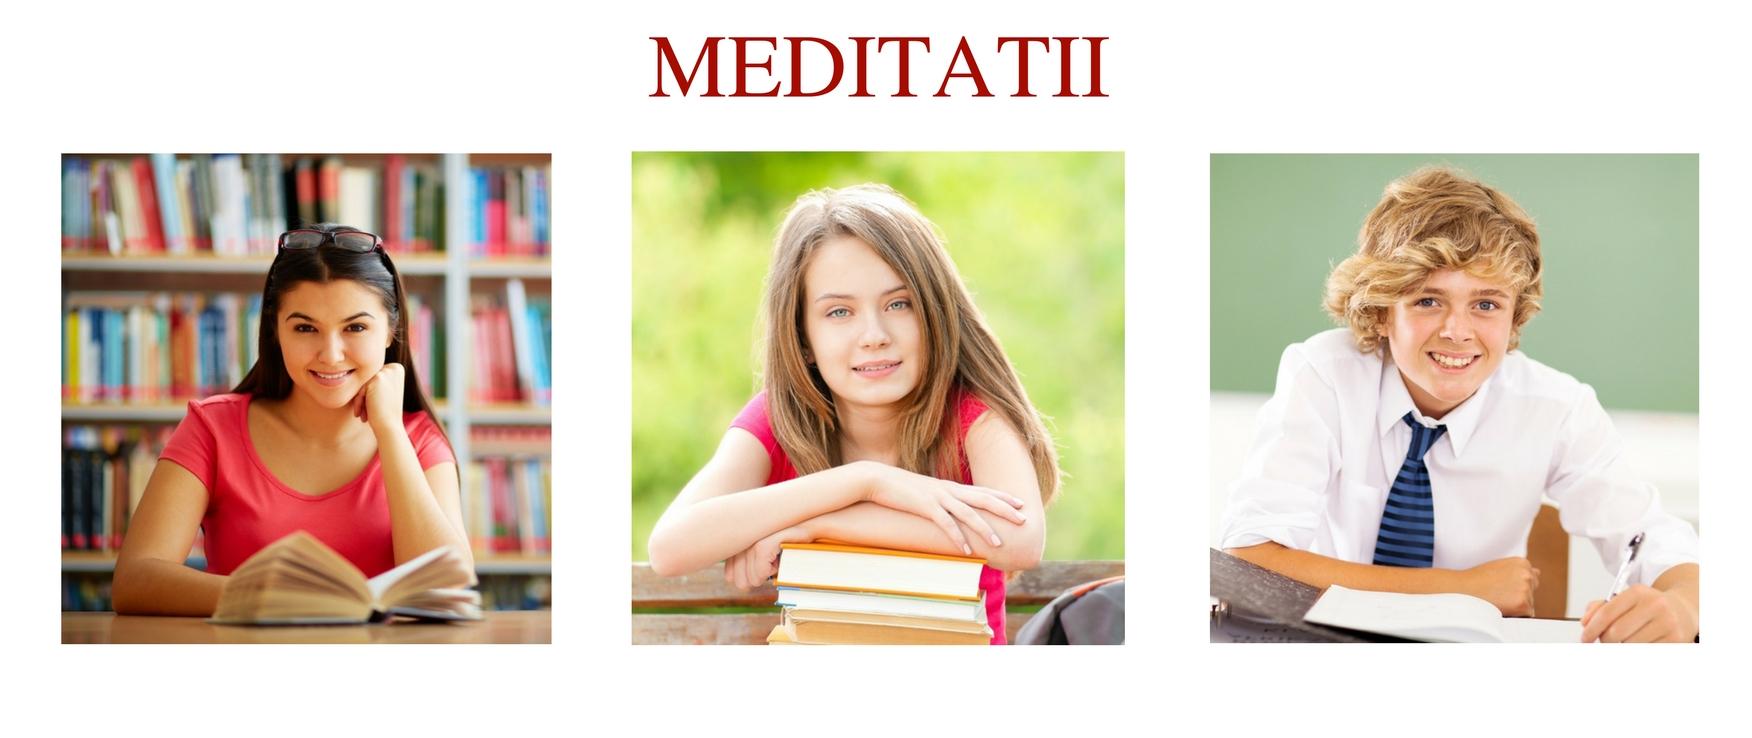 Pachete-Meditatii-Elevi-VictoriaEdu